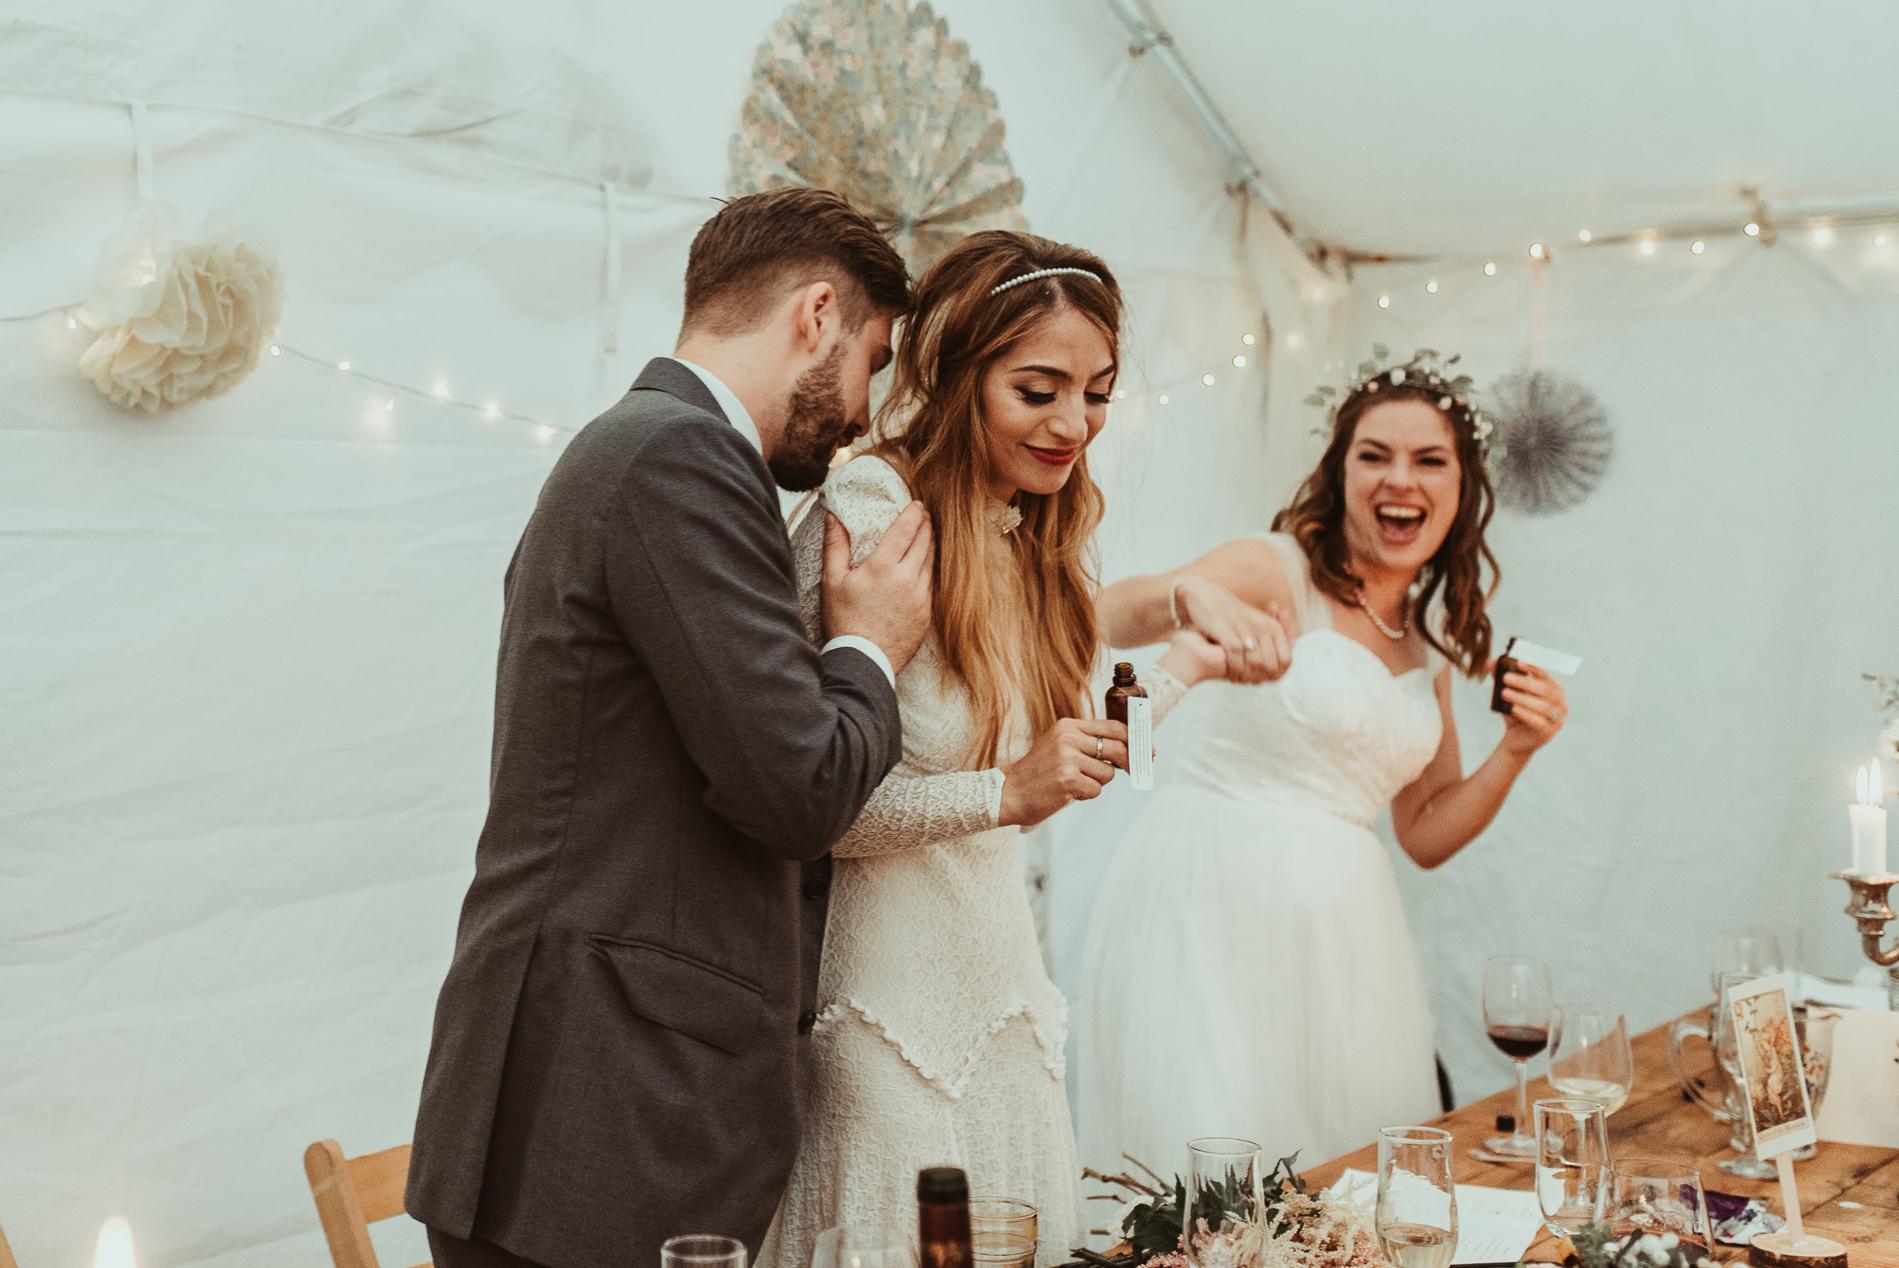 bohemian_wedding_lawshall_church_garden126